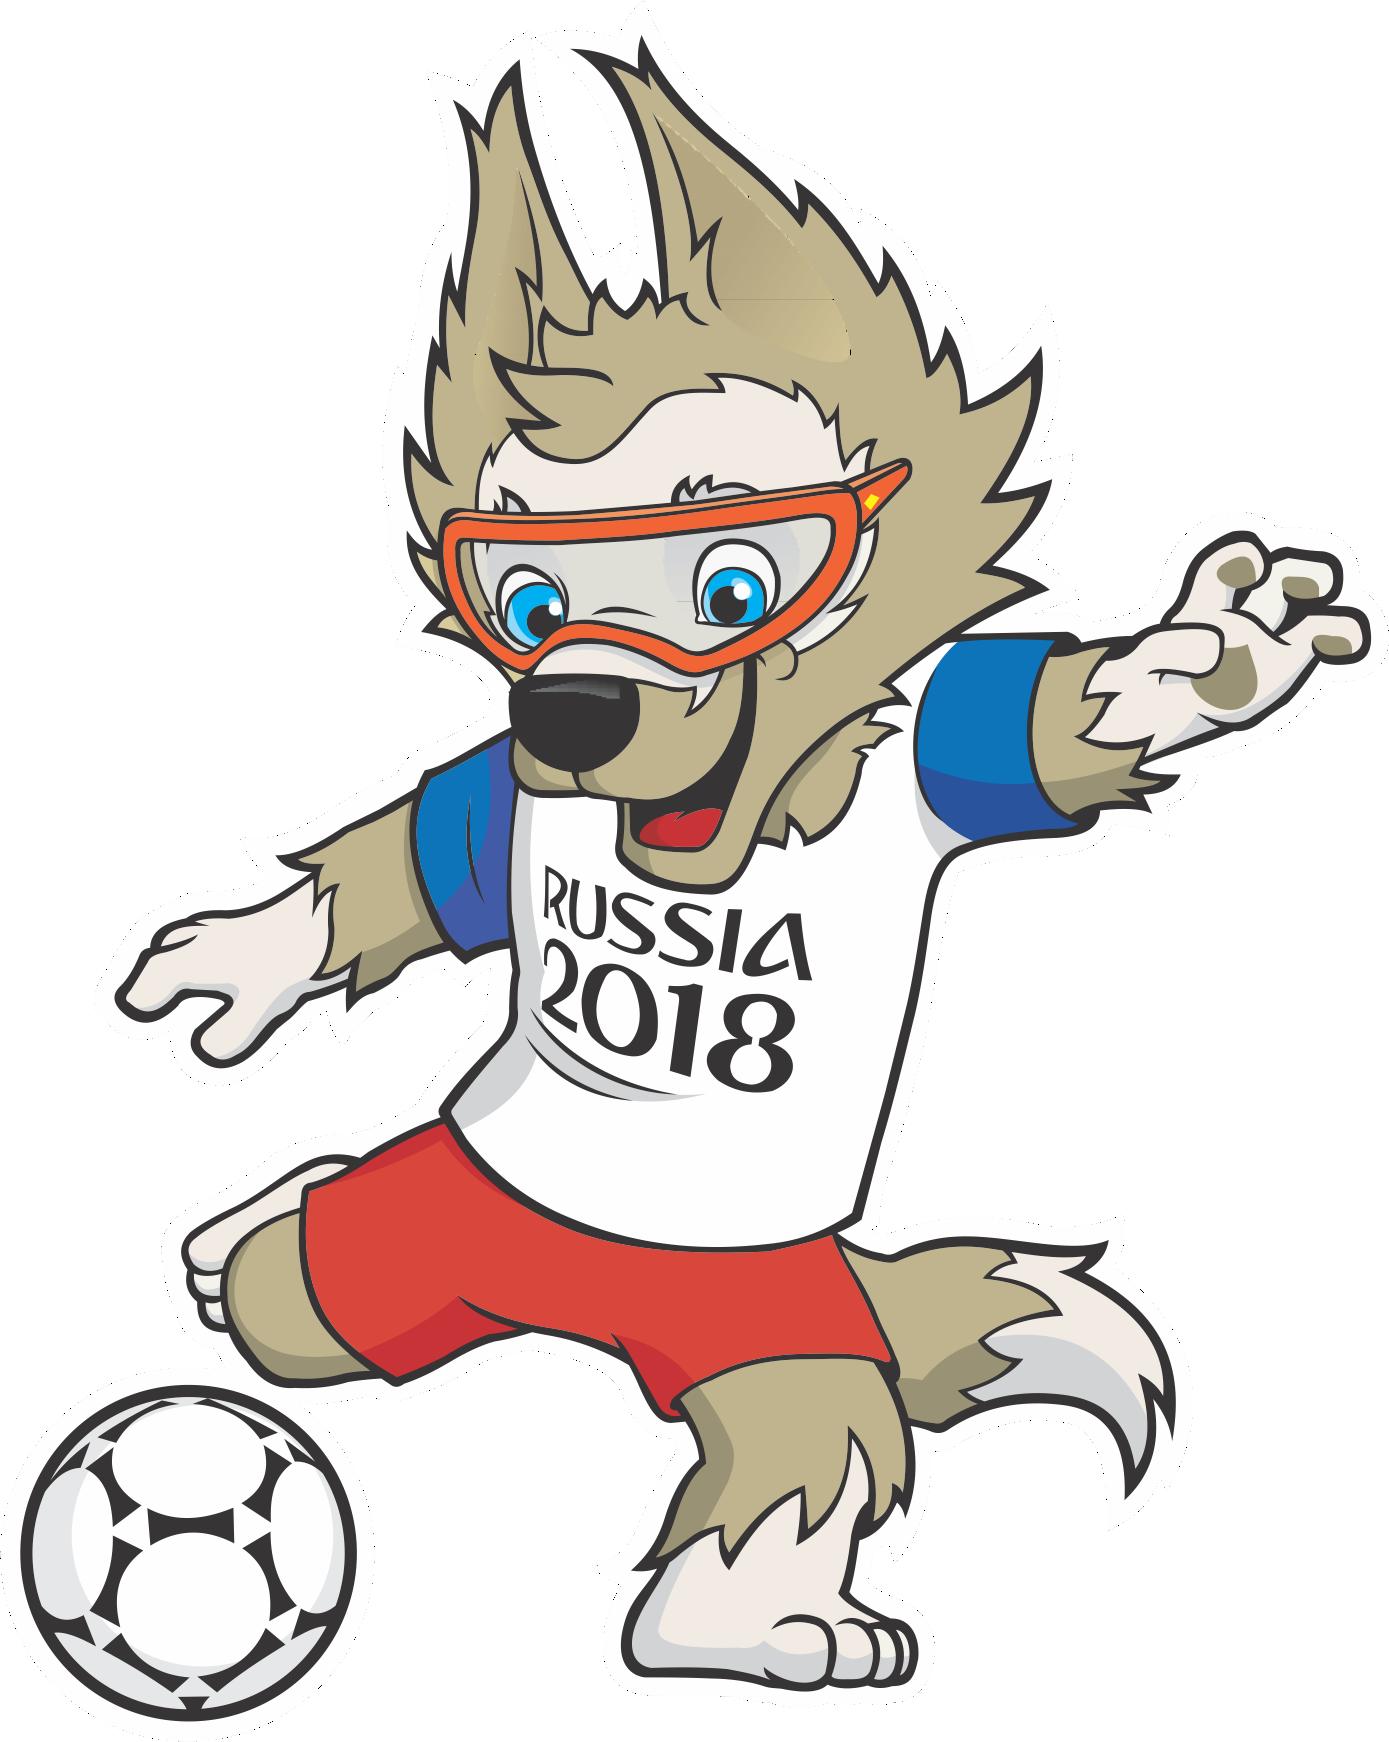 Copa Do Mundo Russia 2018 Mascote Zabivaka 5 Png